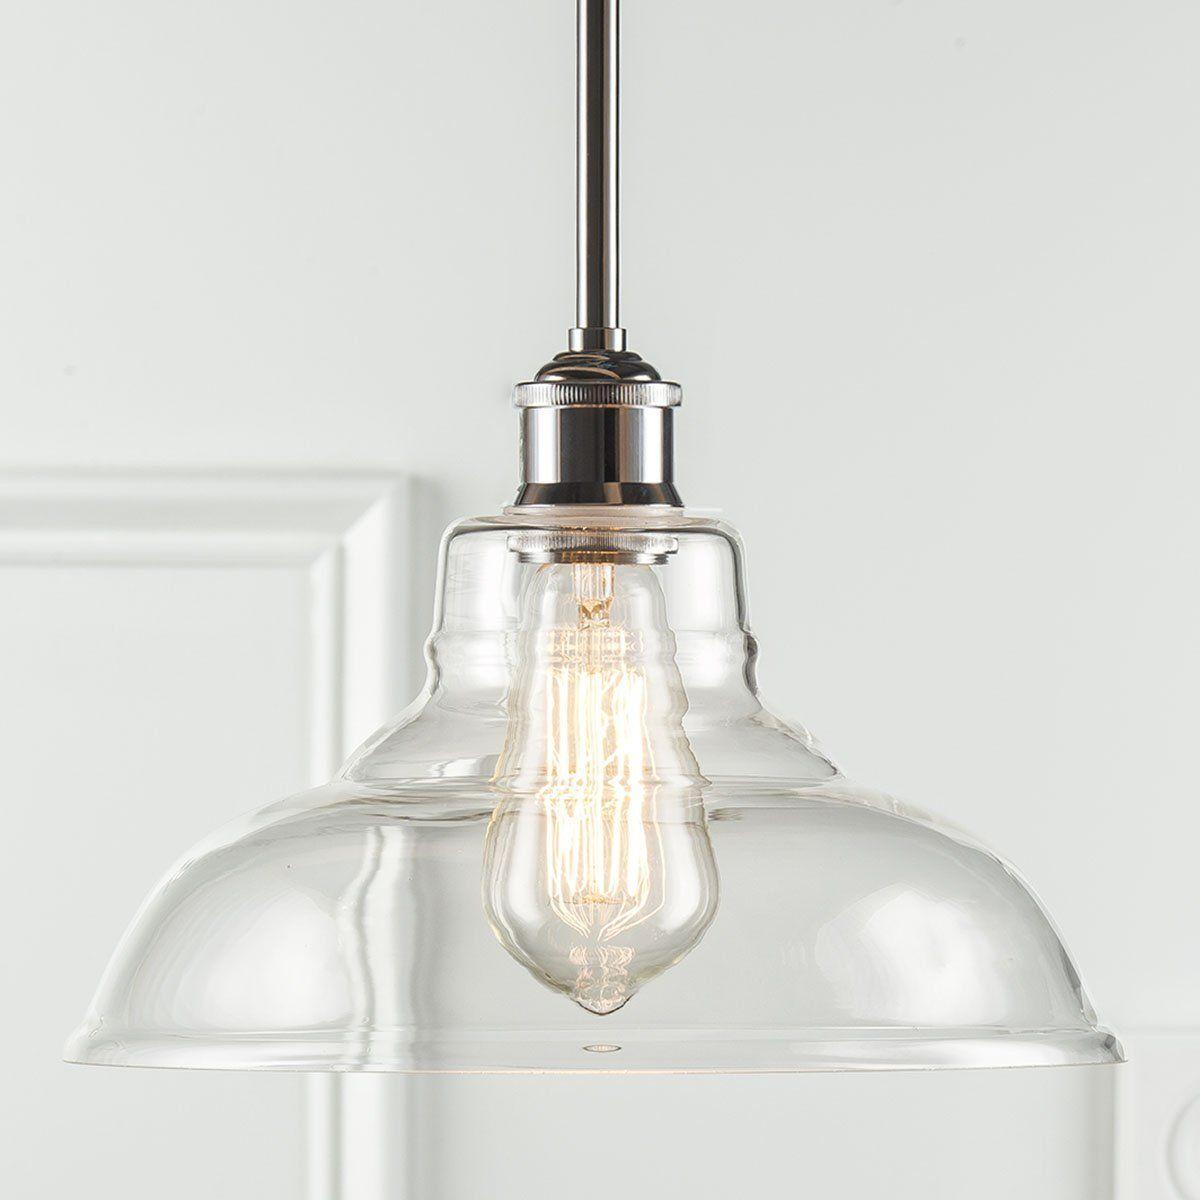 Linea Di Liara Lucera Industrial Factory Stem Hung Pendant Lamp   Polished  Chrome One Light